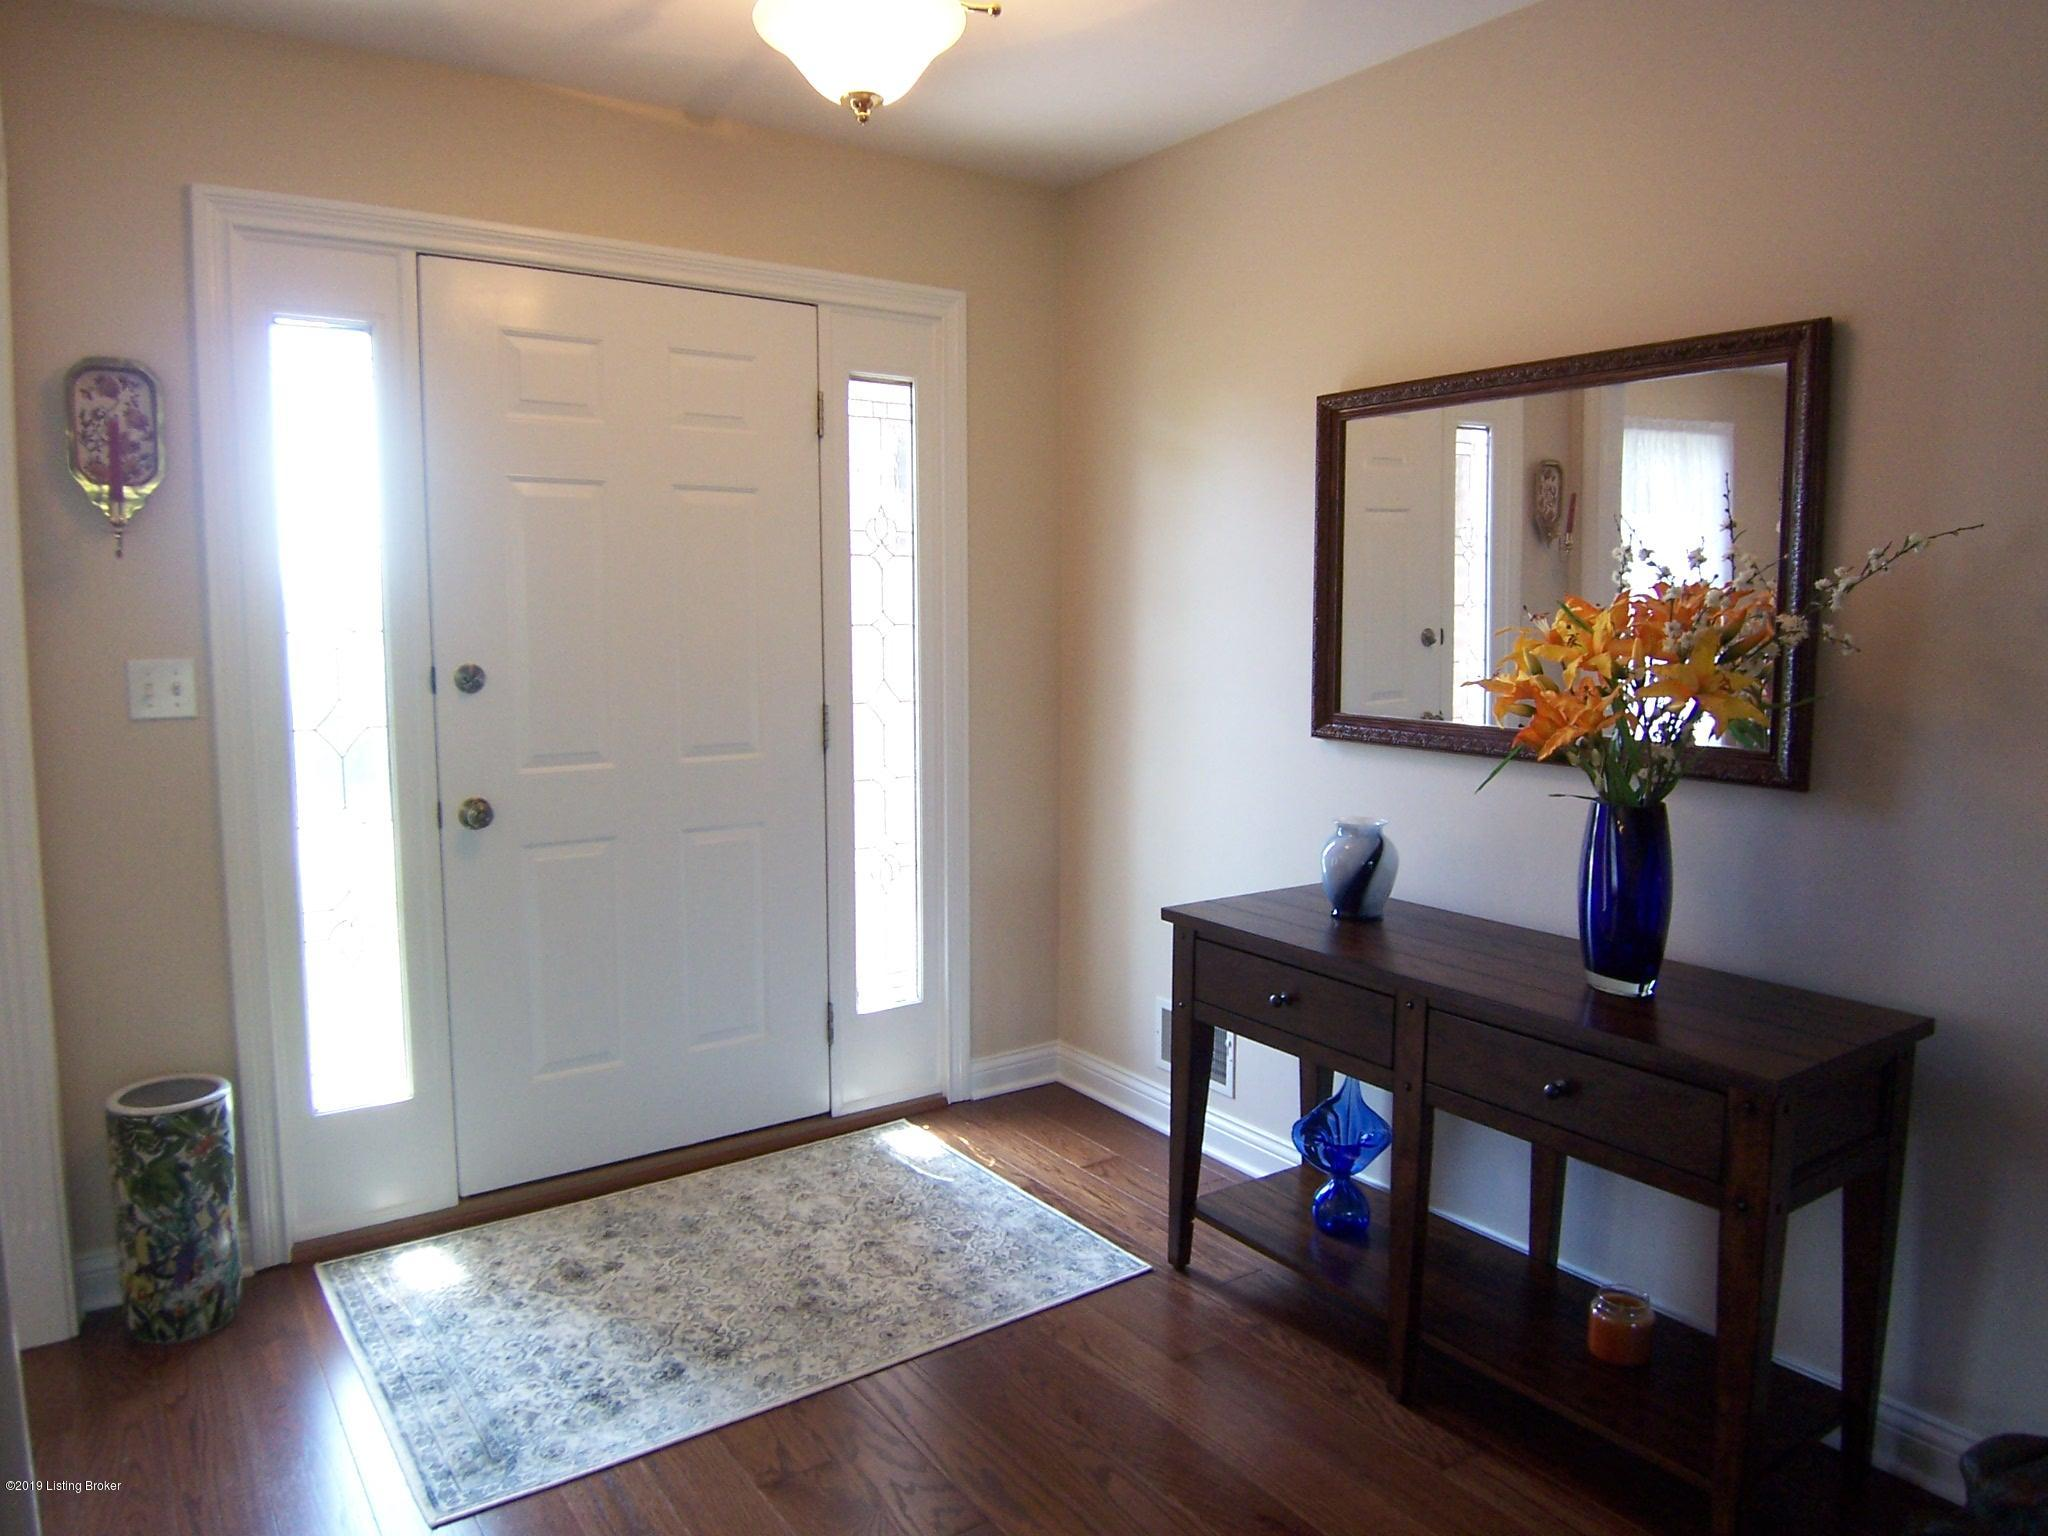 102 Warrington Dr, Bardstown, Kentucky 40004, 3 Bedrooms Bedrooms, 7 Rooms Rooms,2 BathroomsBathrooms,Residential,For Sale,Warrington,1532544